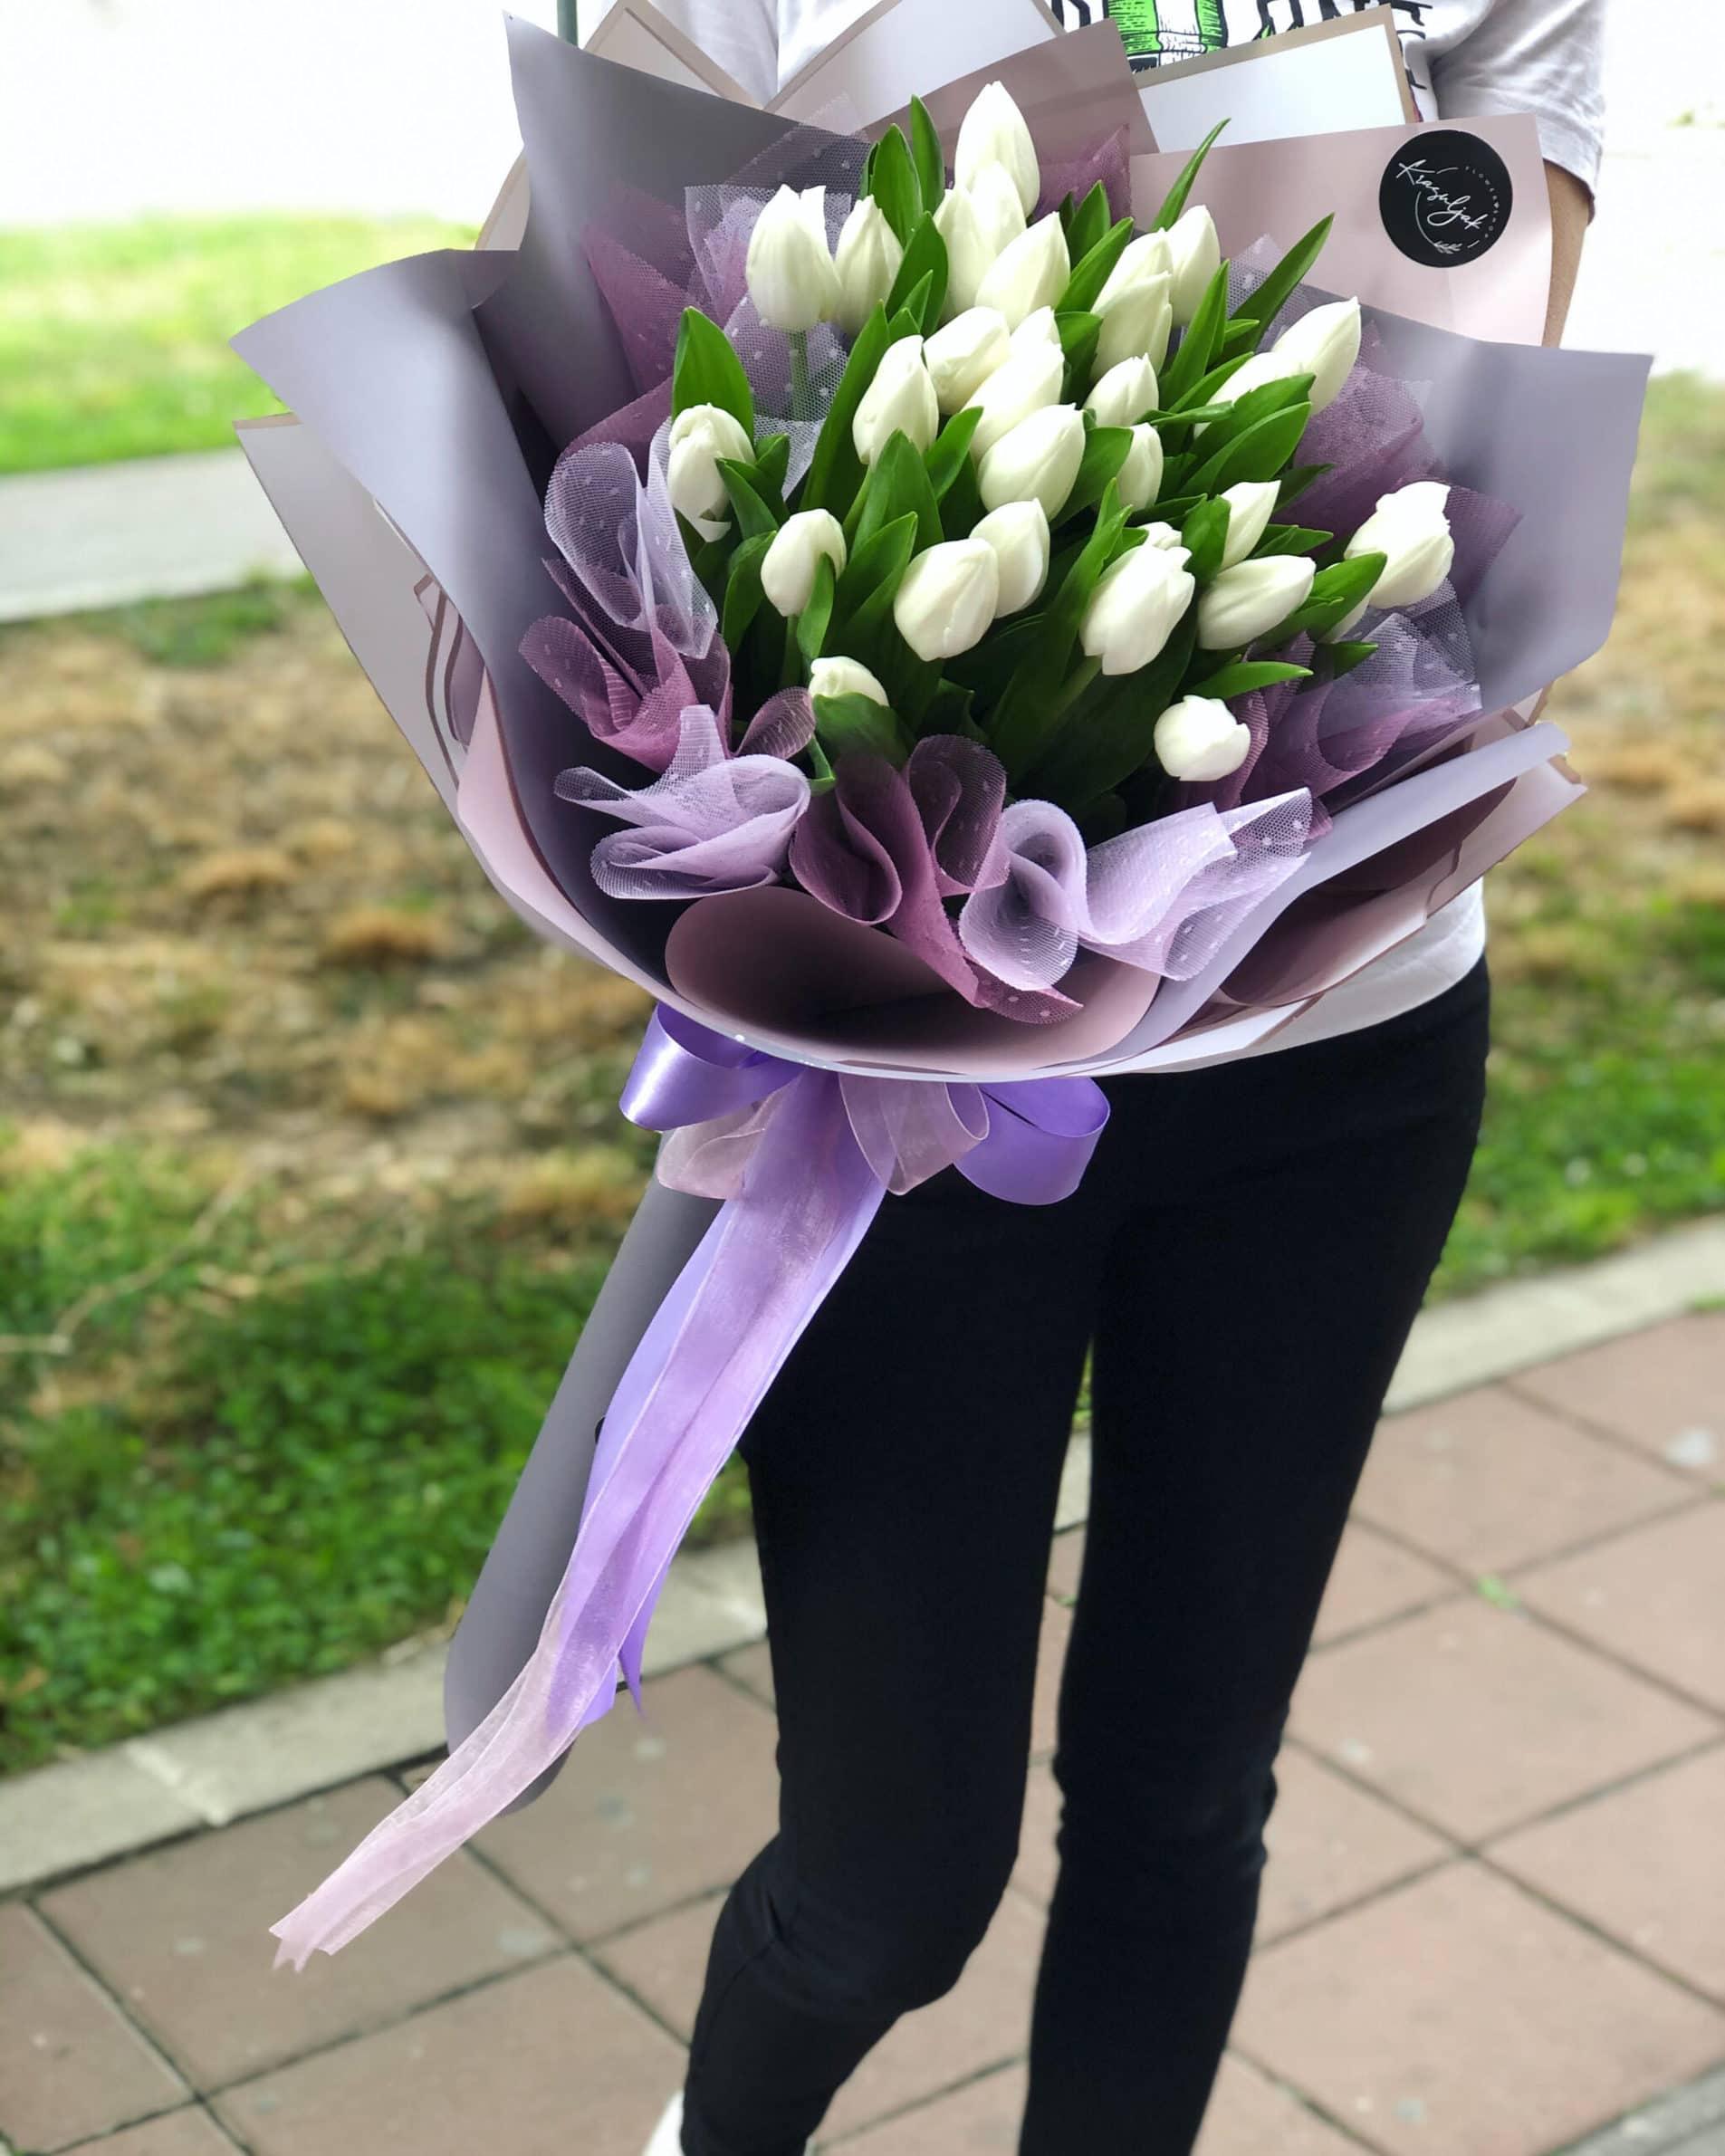 Cveće - buket belih lala u lila papiru